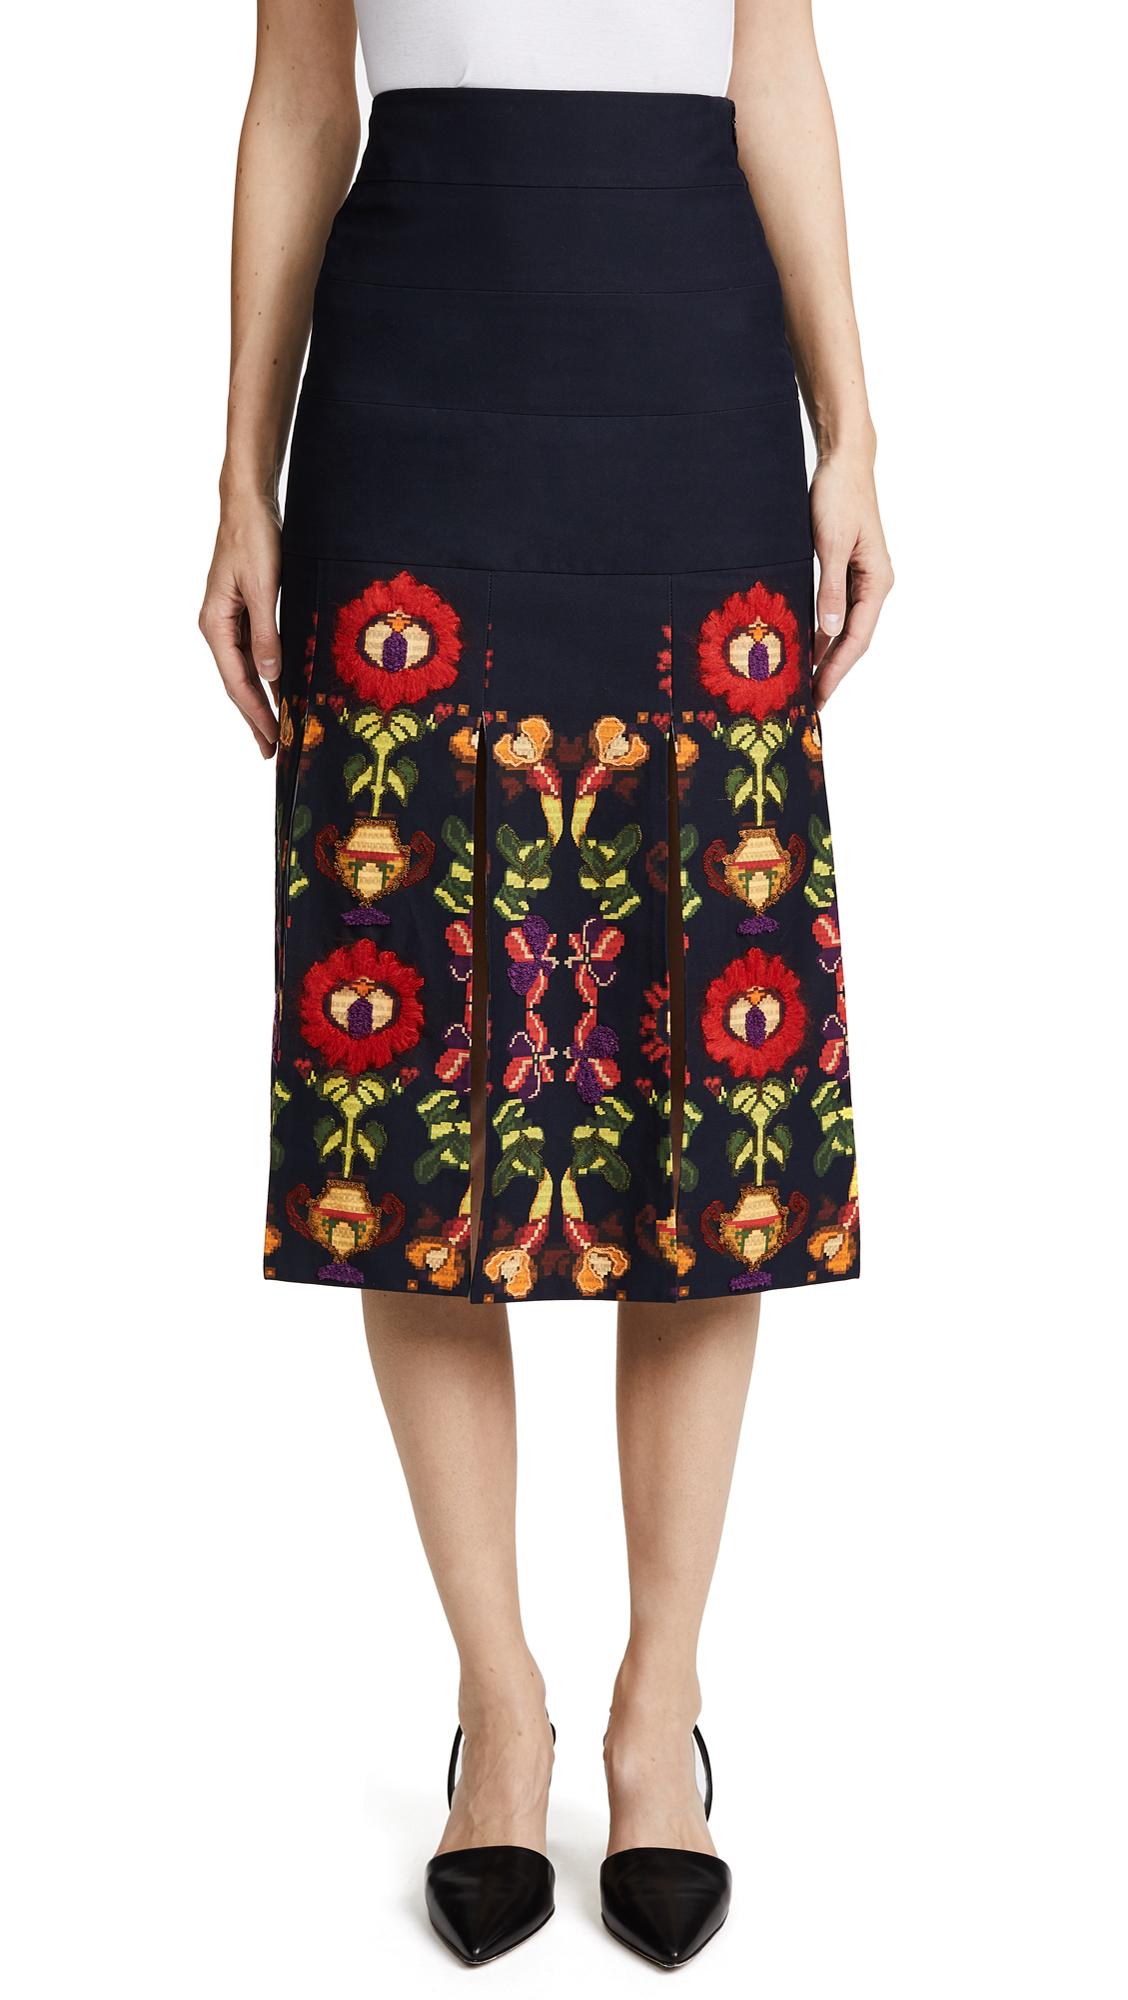 Stella Jean Floral Trompe lOeil Skirt - Black Multi